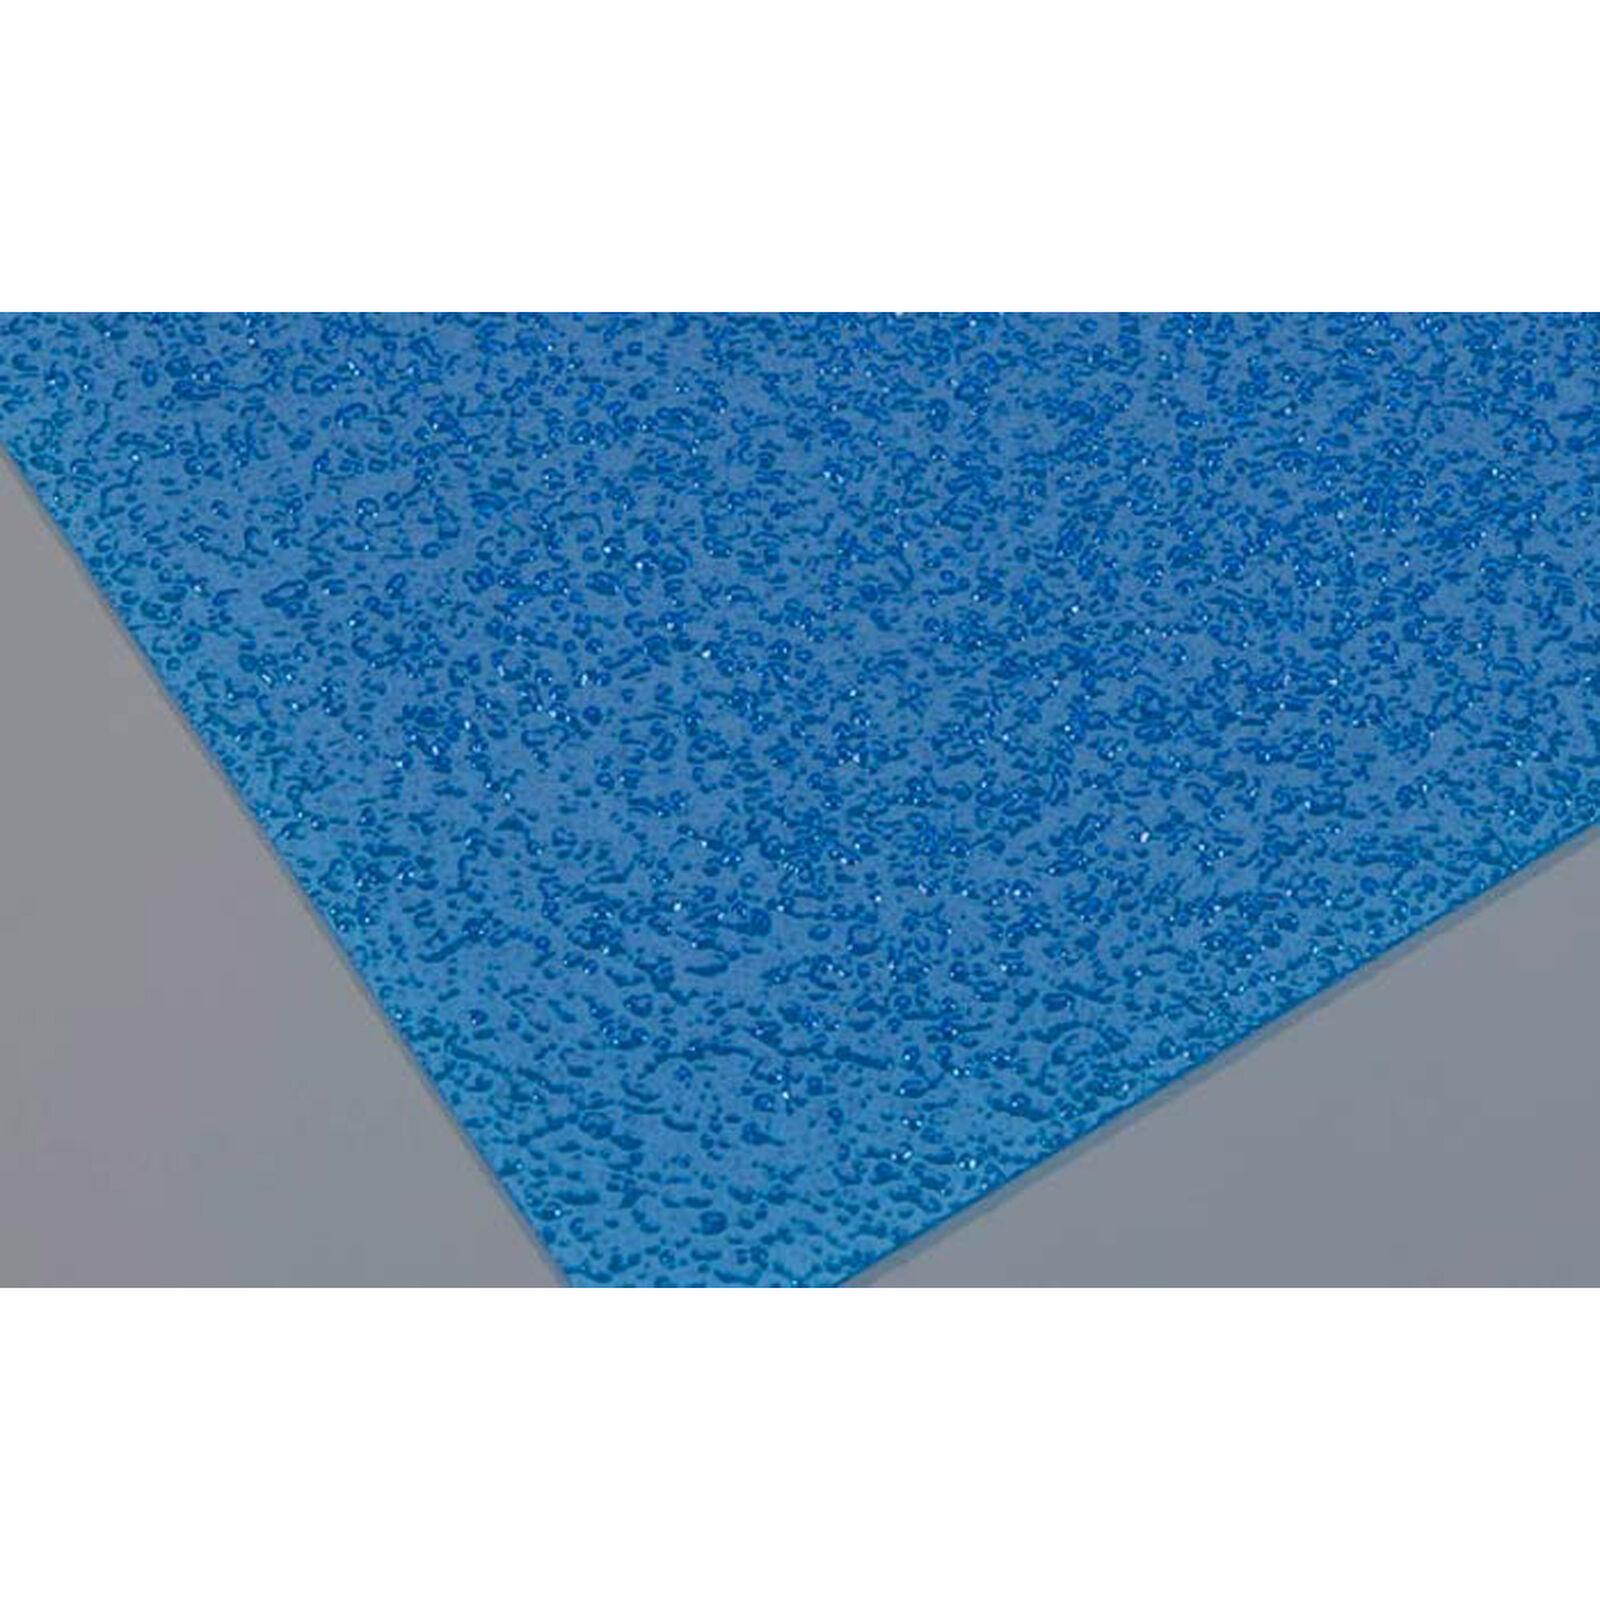 "Agitated Blue Water WPSB-308 (6"" X 9"")"